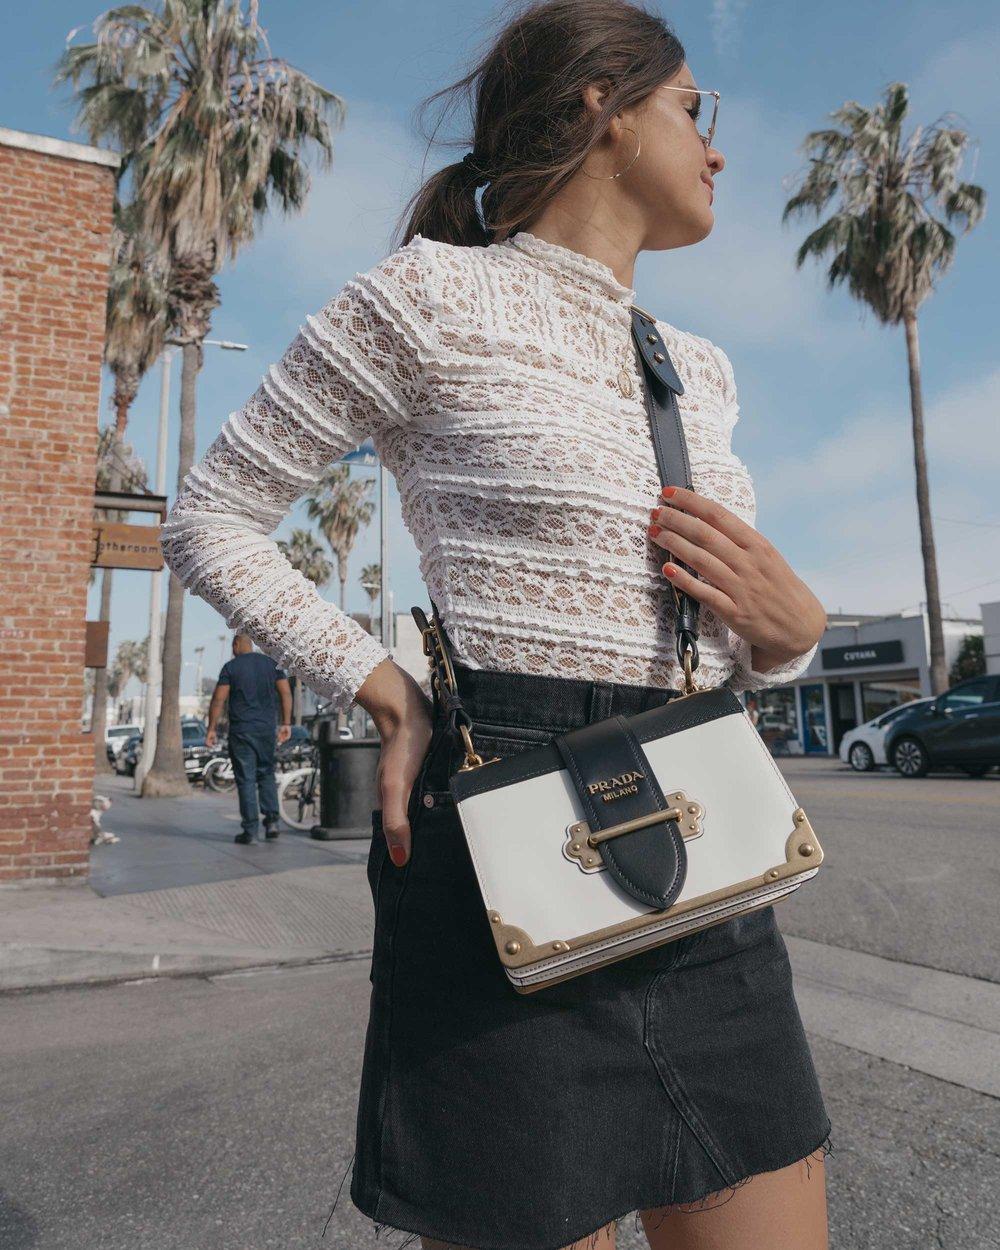 Prada City Saffiano Leather Cahier Bag, Black Denim Skirt, Summer outfit, Abbot Kinney California8.jpg